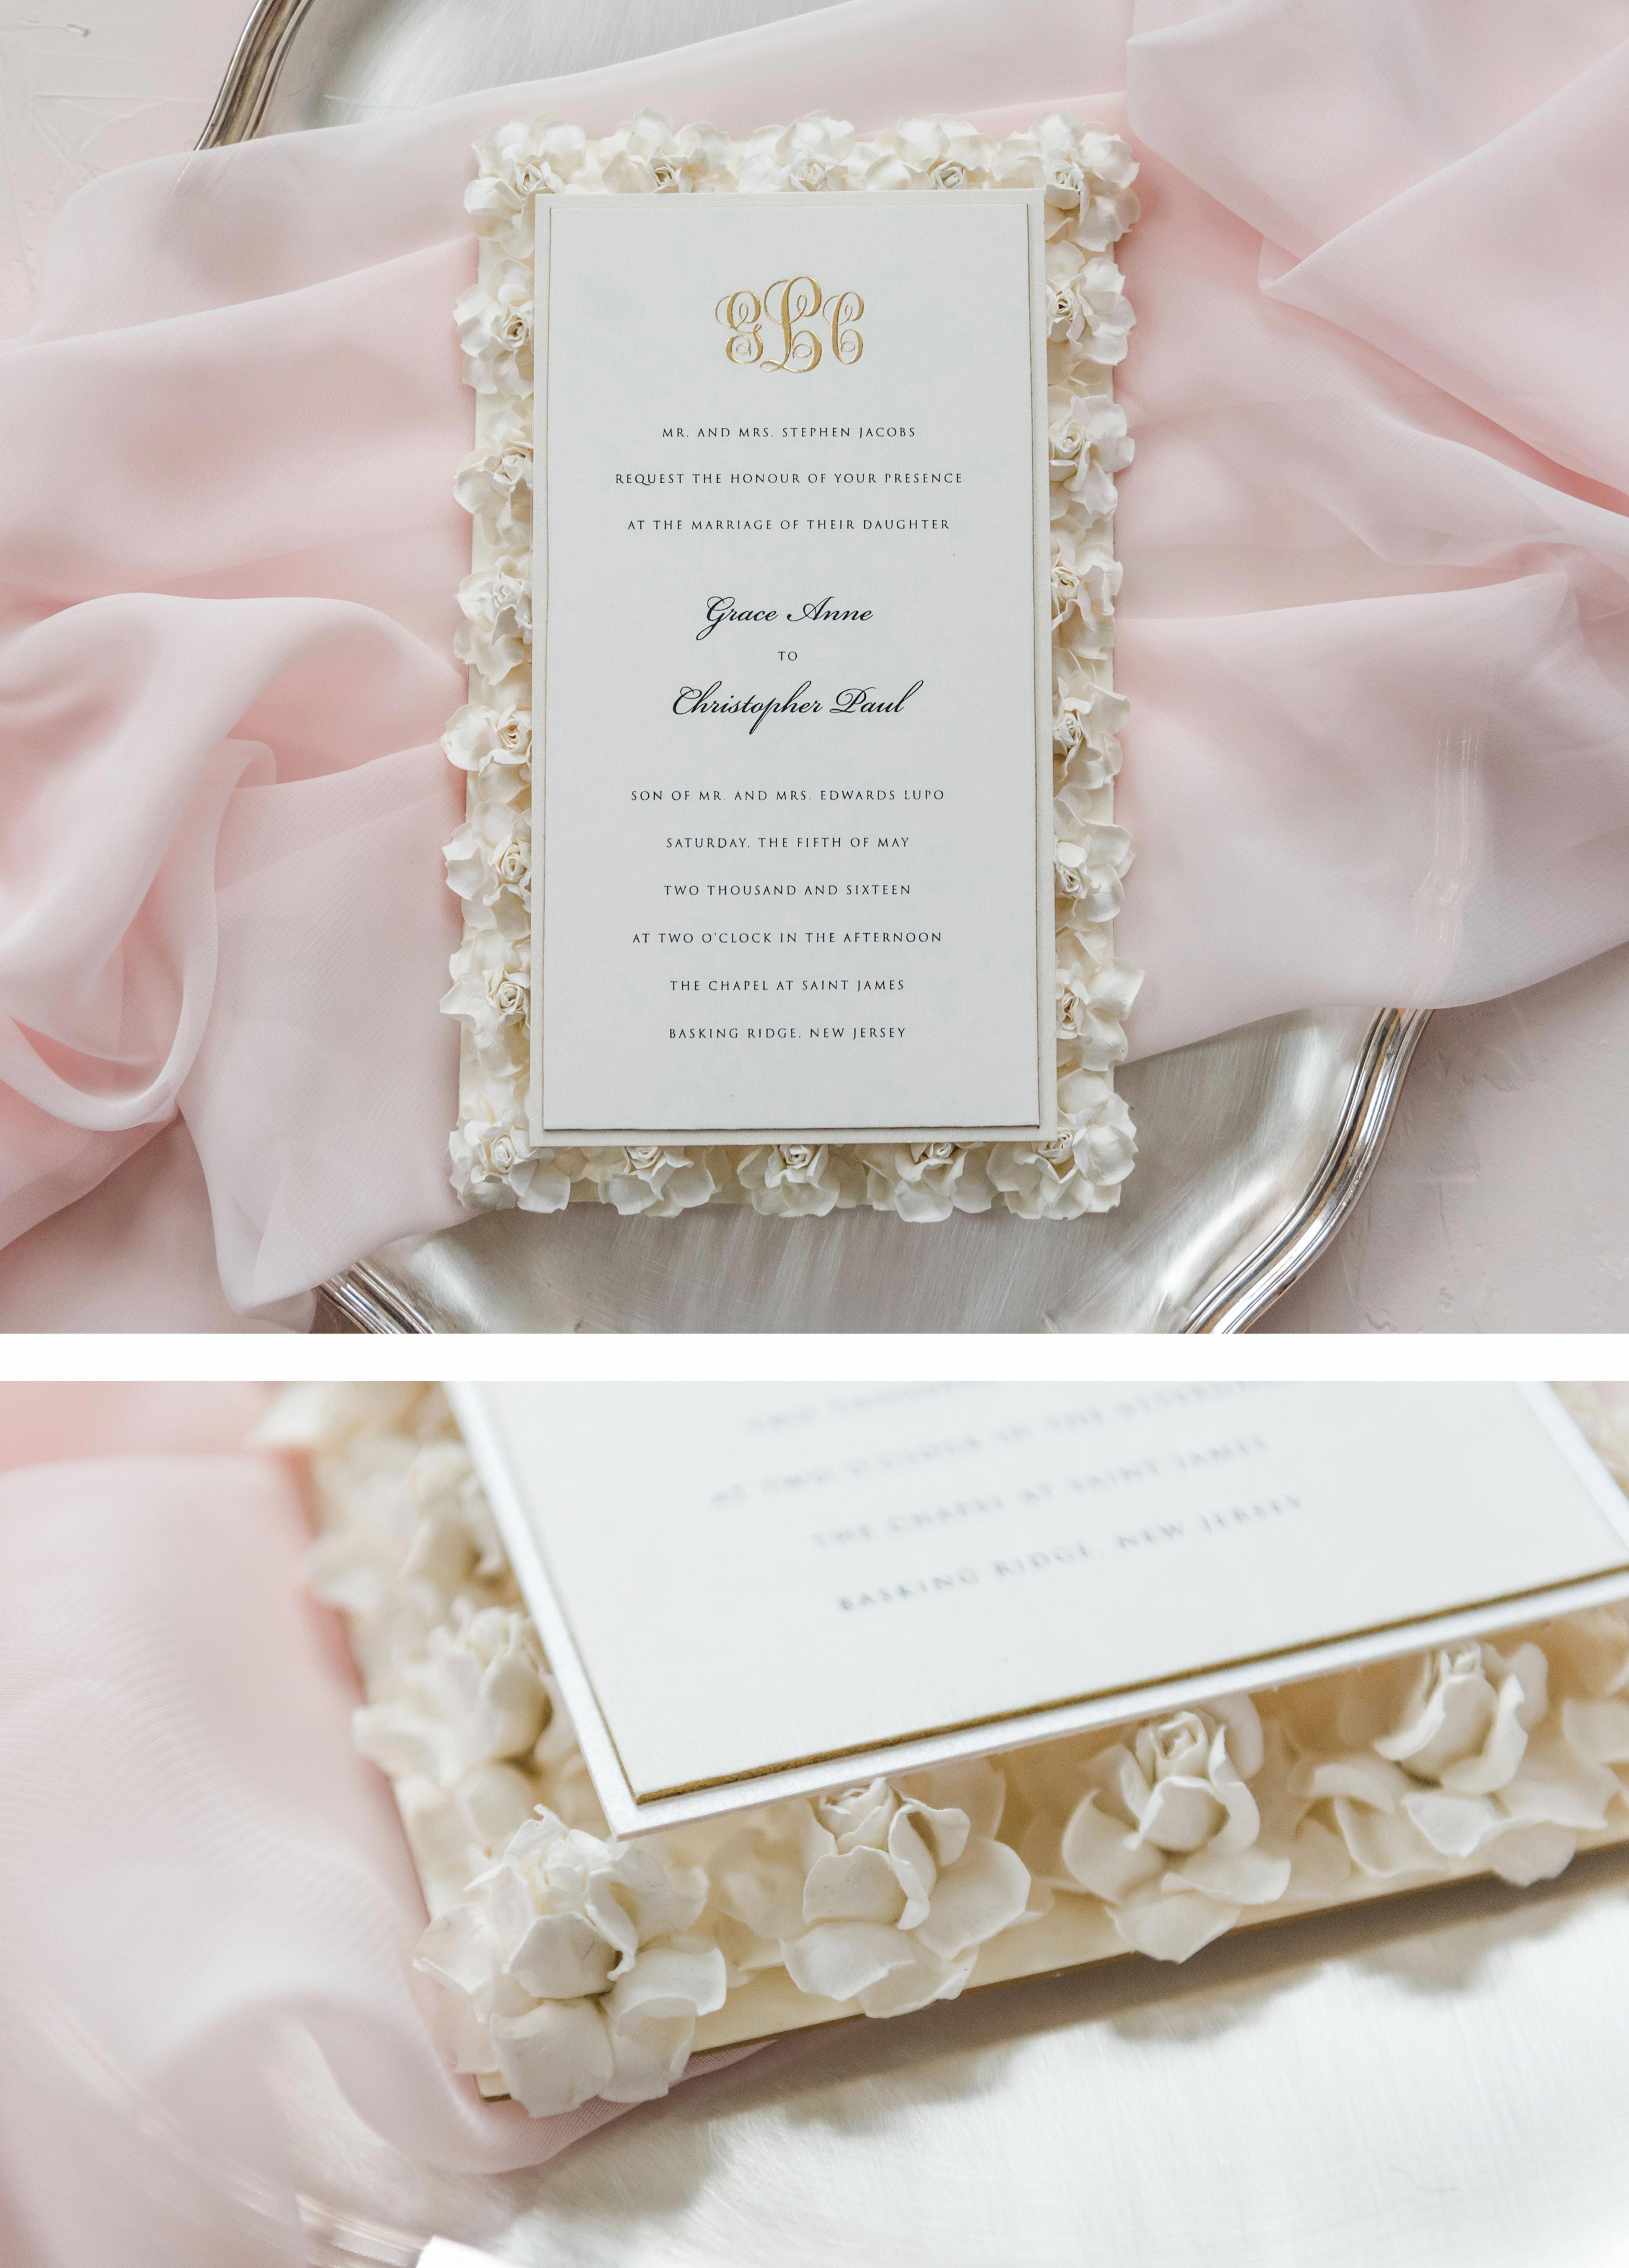 Inexpensive Wedding Locations WeddingWebsiteExamples in